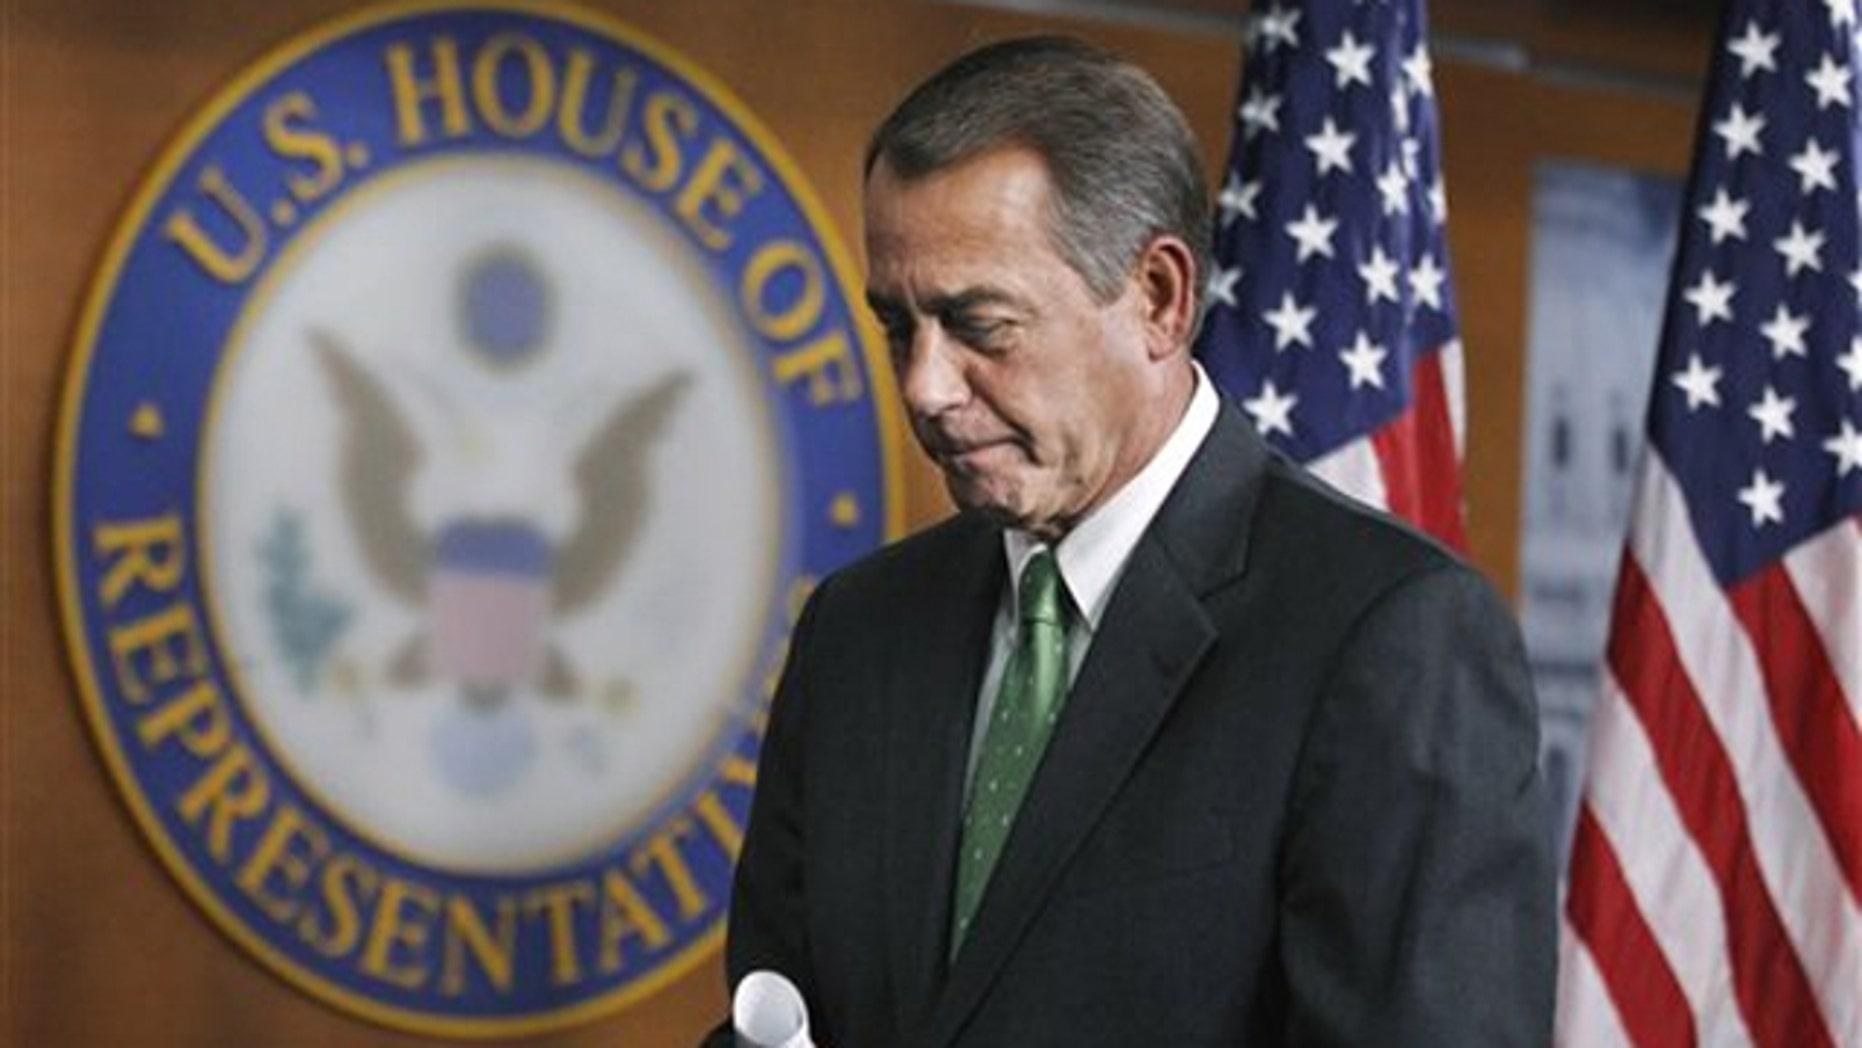 House Speaker John Boehner leaves a news conference on Capitol Hill in Washington Feb. 10.